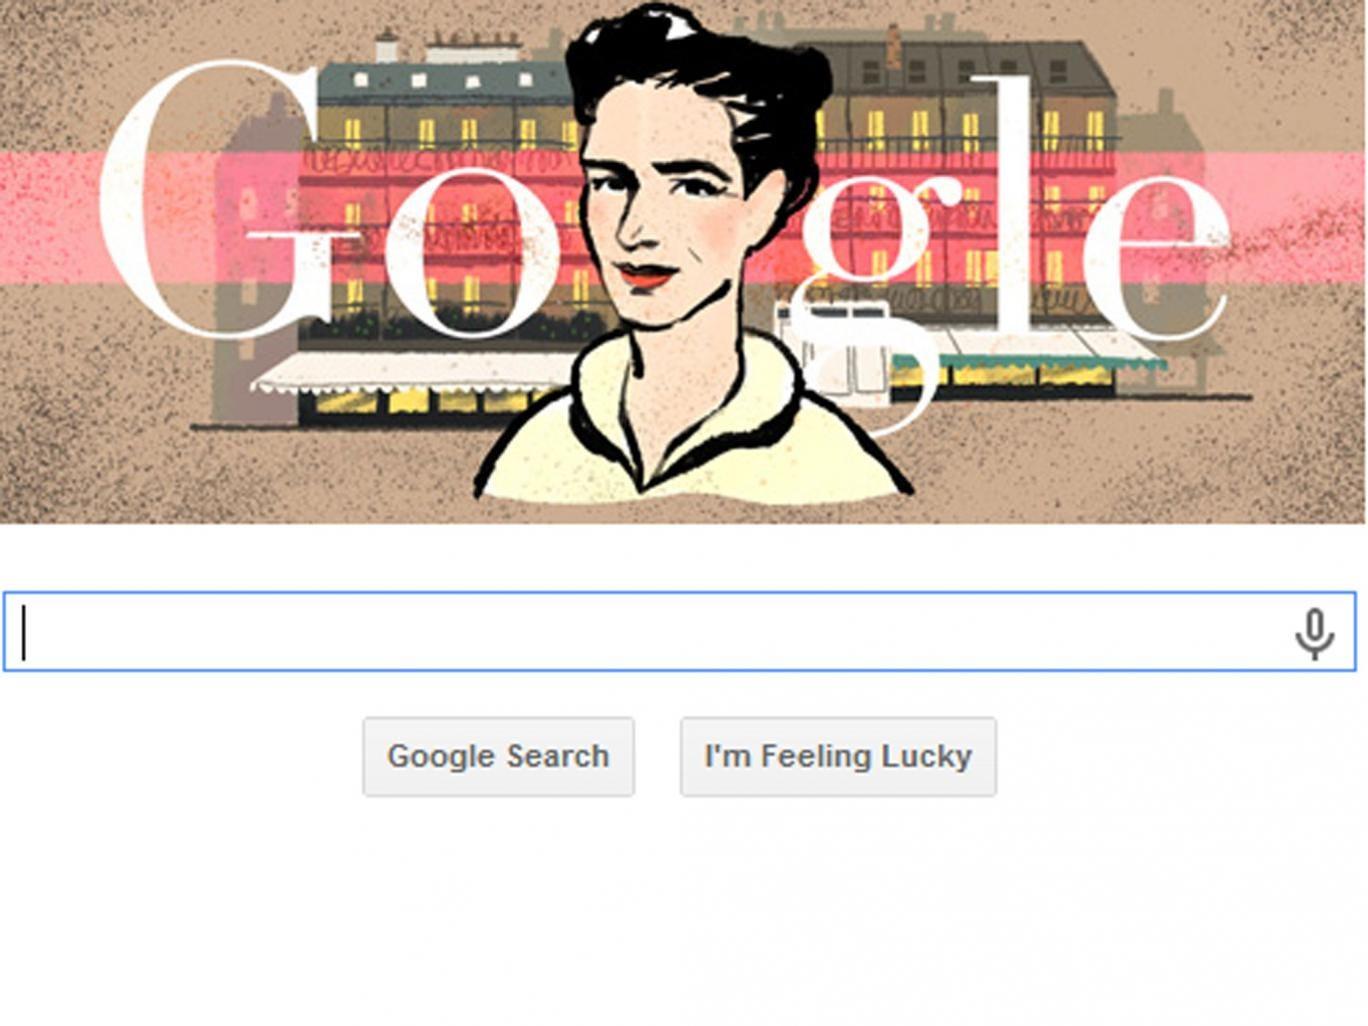 Google's tribute to French philosopher Simone de Beauvoir